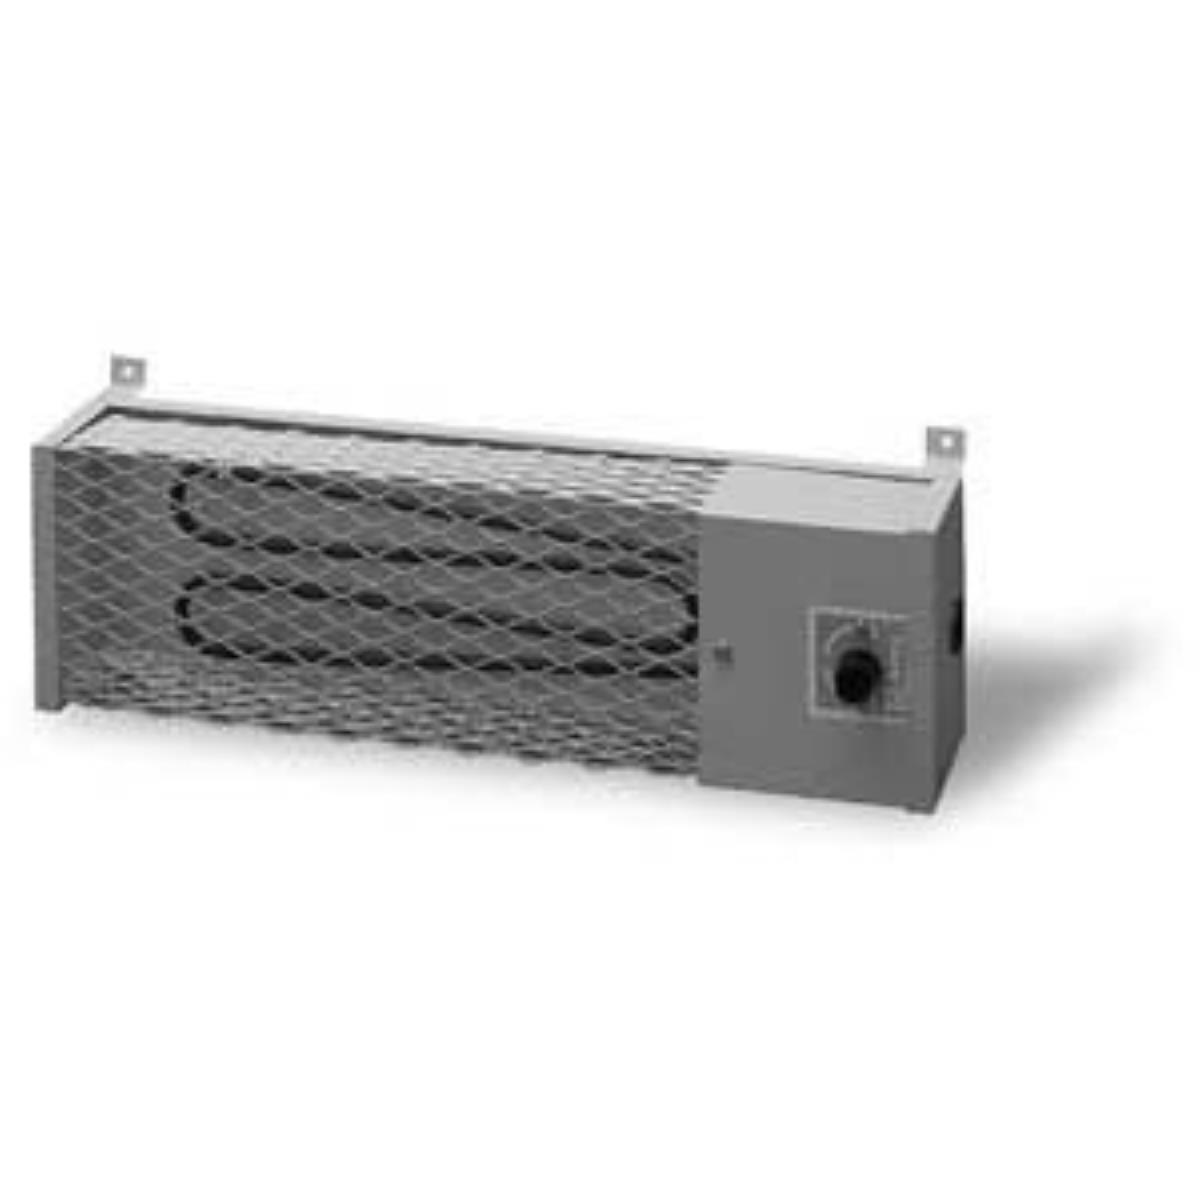 King Electric U2425 Pump House Heater 240/120V 250/62 Watt